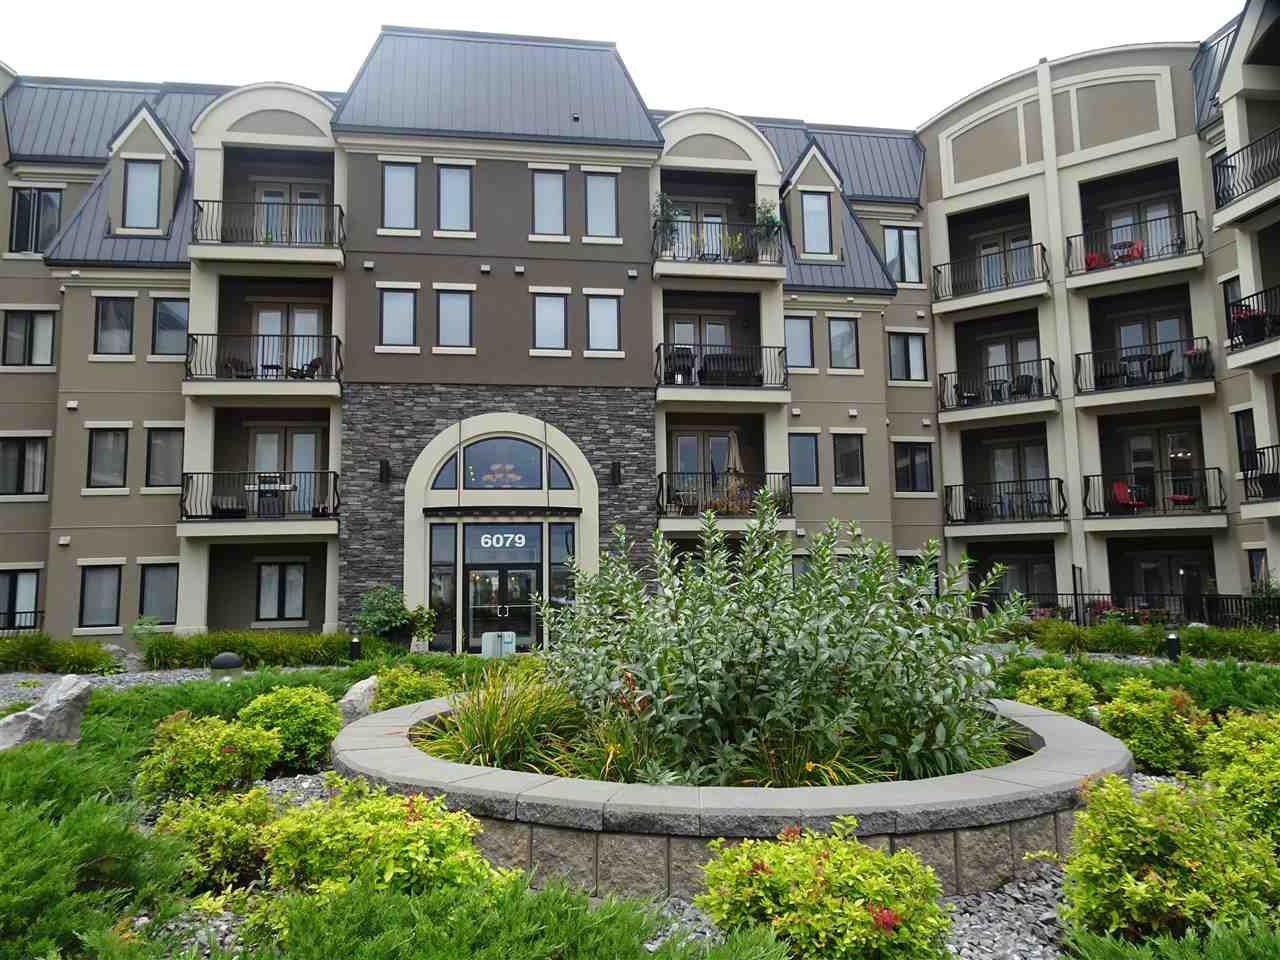 Main Photo: 356 6079 MAYNARD Way in Edmonton: Zone 14 Condo for sale : MLS®# E4128726